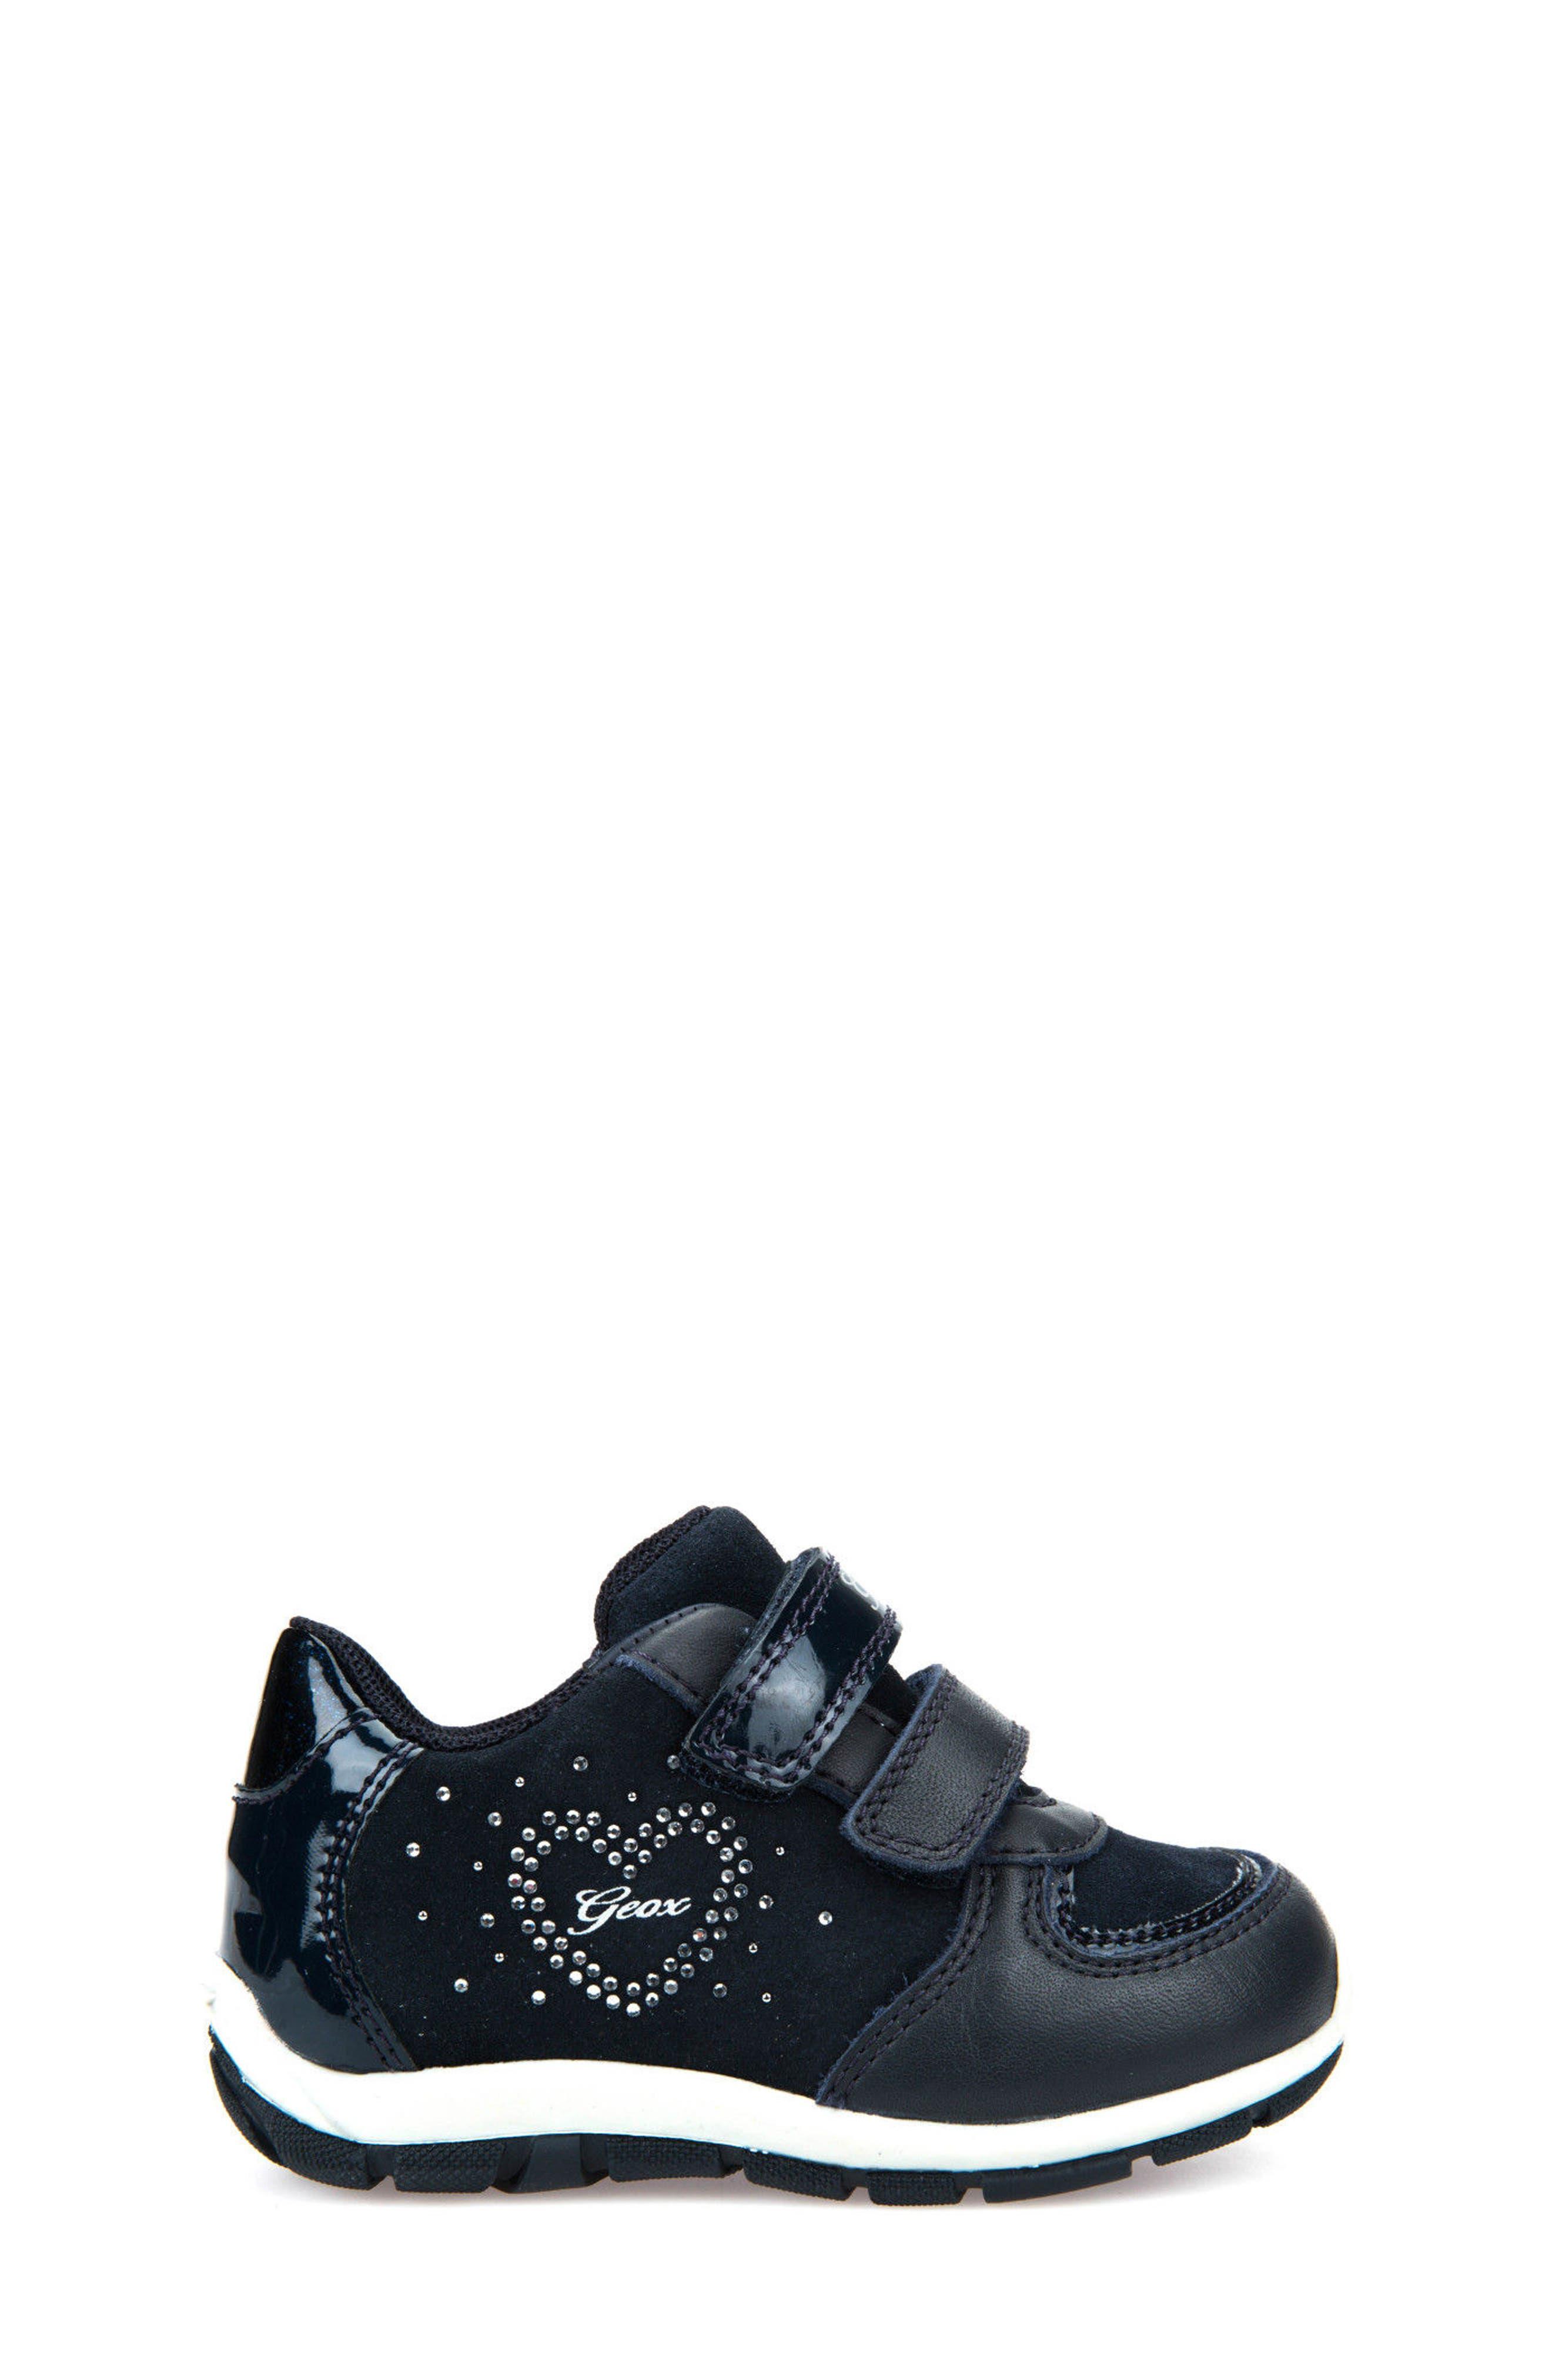 Alternate Image 3  - Geox Shaax Love Sneaker (Walker & Toddler)